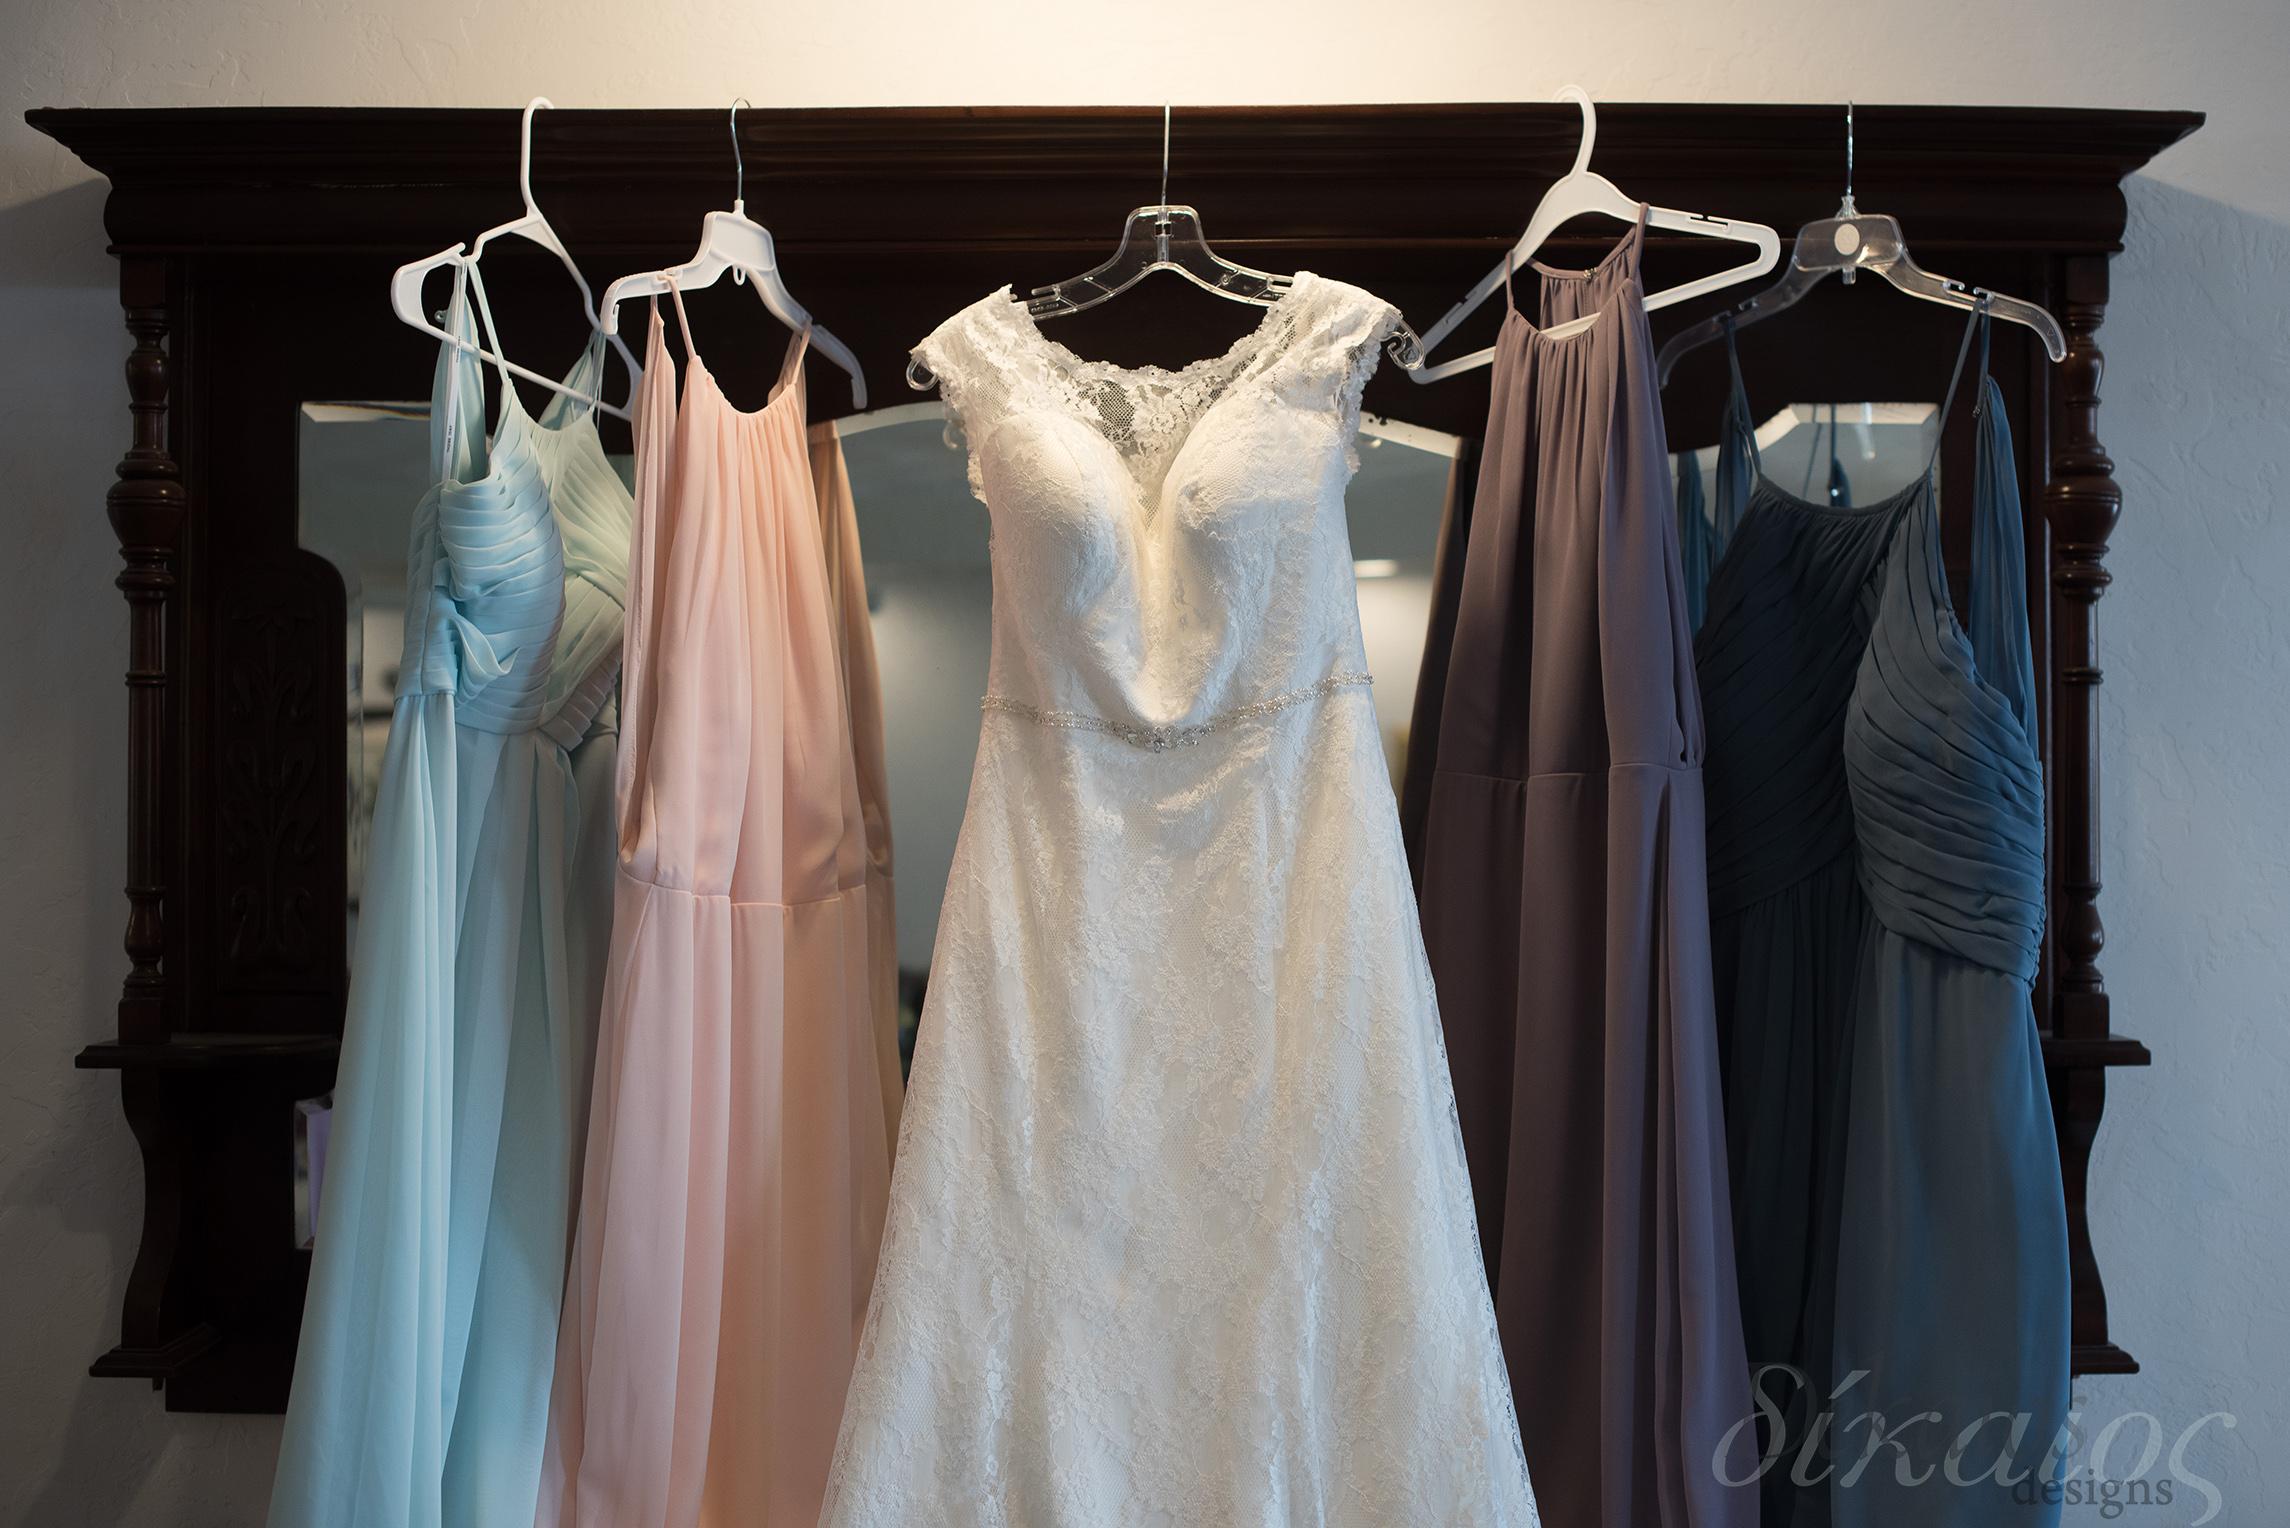 The girls dresses were so unique with such a wonderful color scheme.